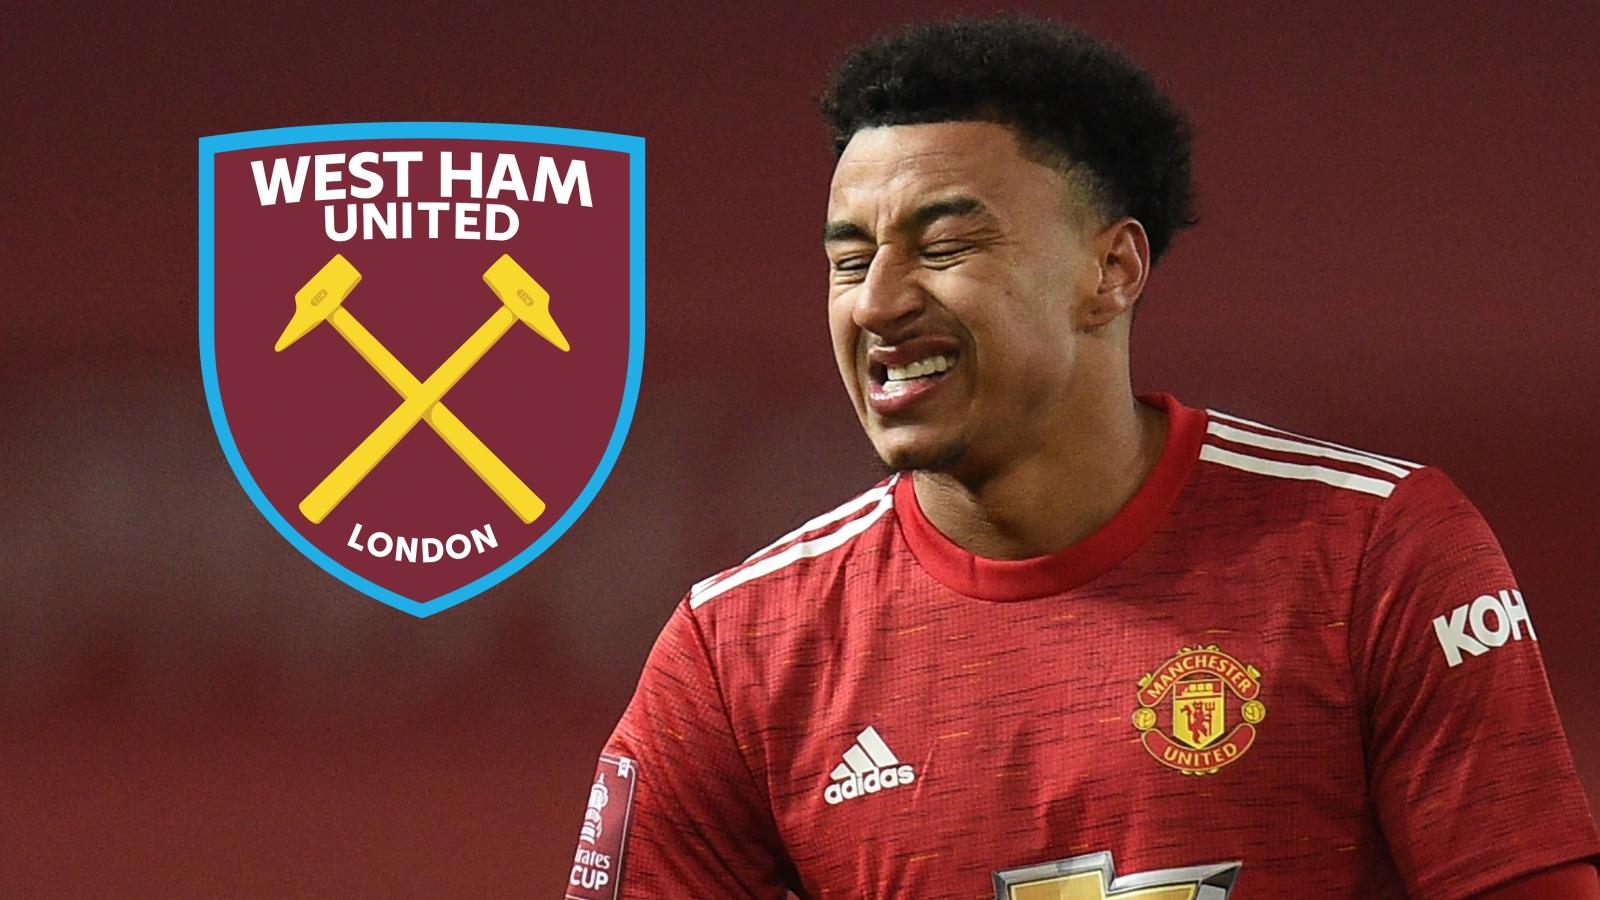 Man Utd outcast Lingard joins West Ham on loan until end of 2020-21 season